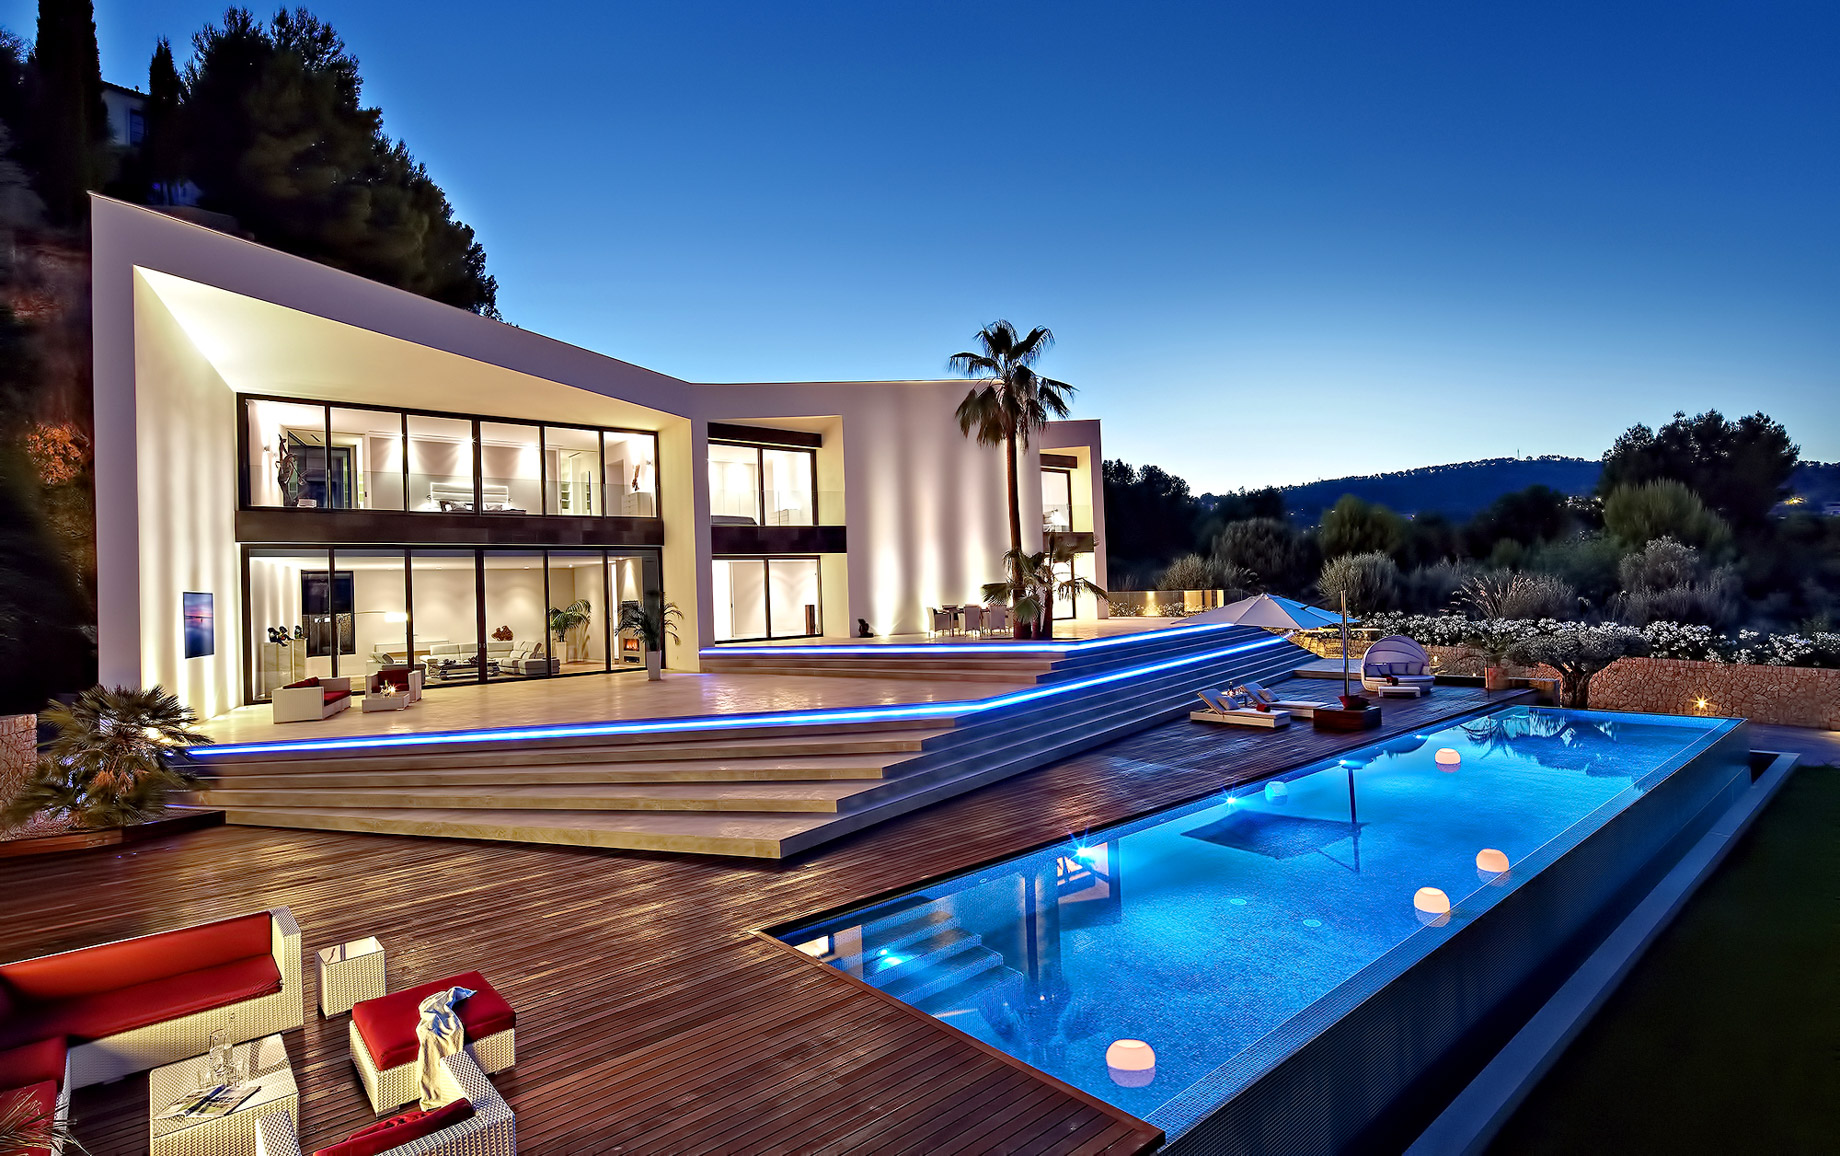 Villa Origami Luxury Residence – Son Vida, Mallorca, Spain | The Pinnacle List